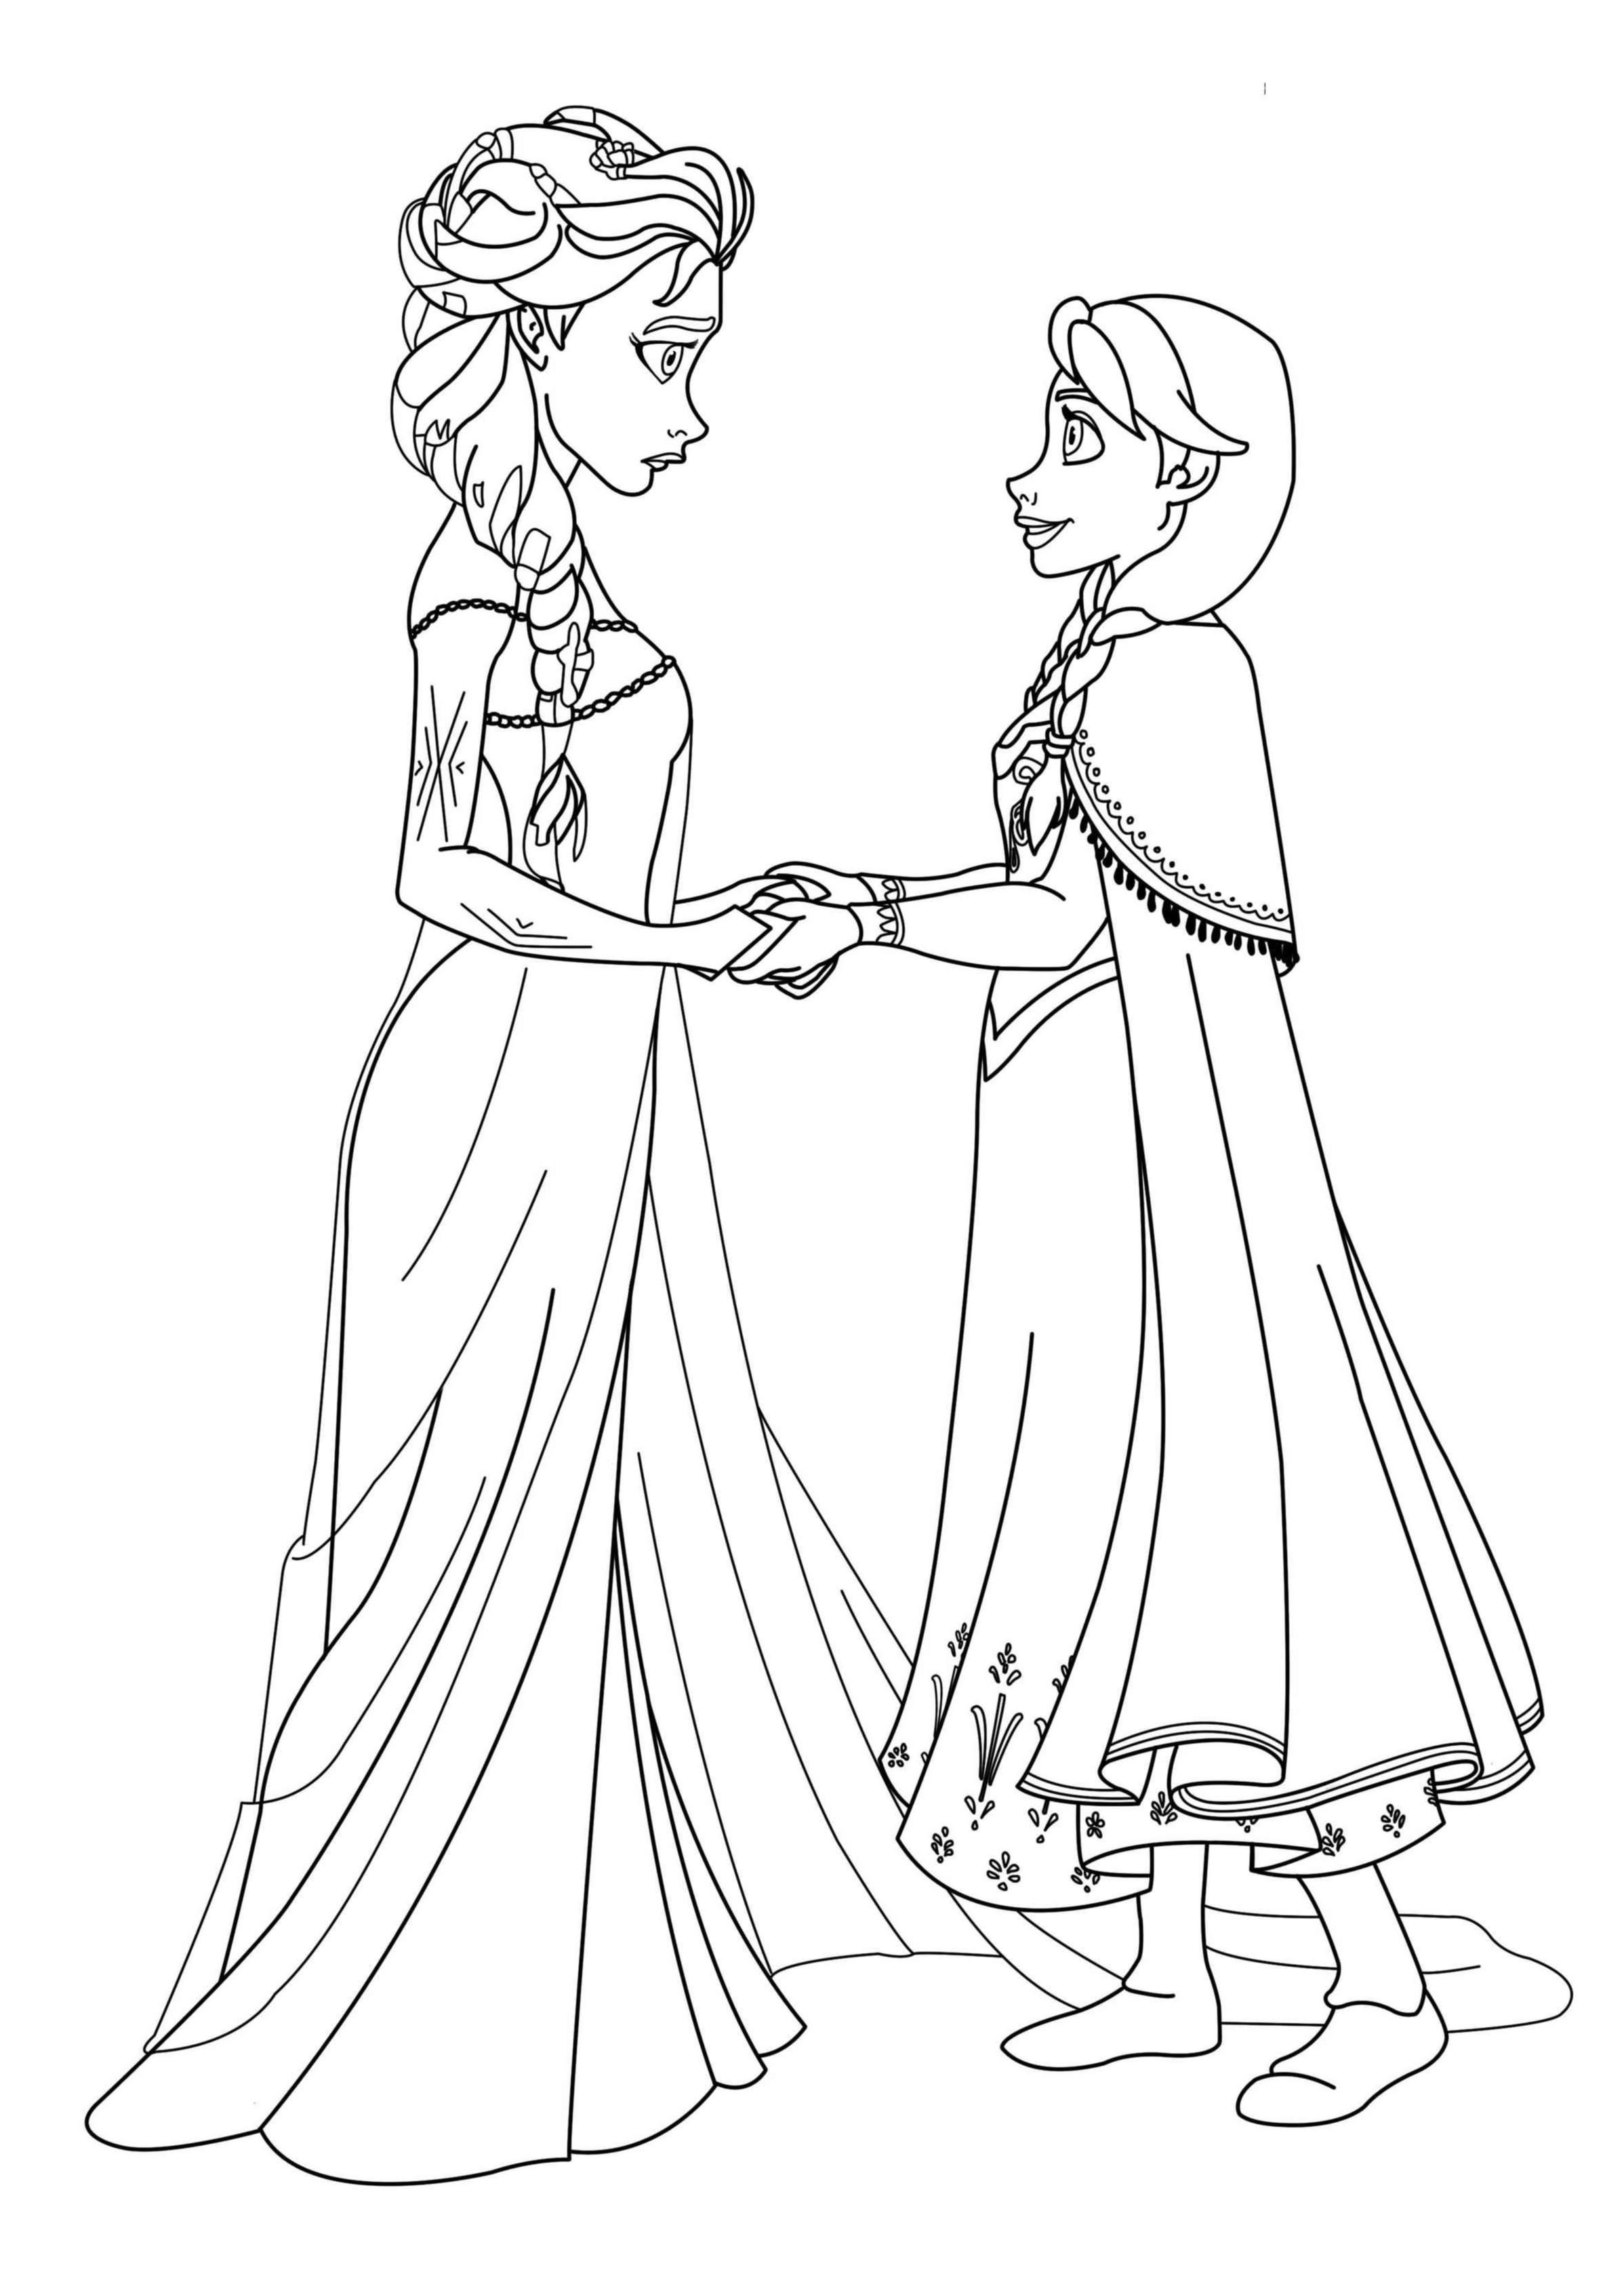 144 Dibujos De Disney Frozen Para Colorear Oh Kids Page 9e